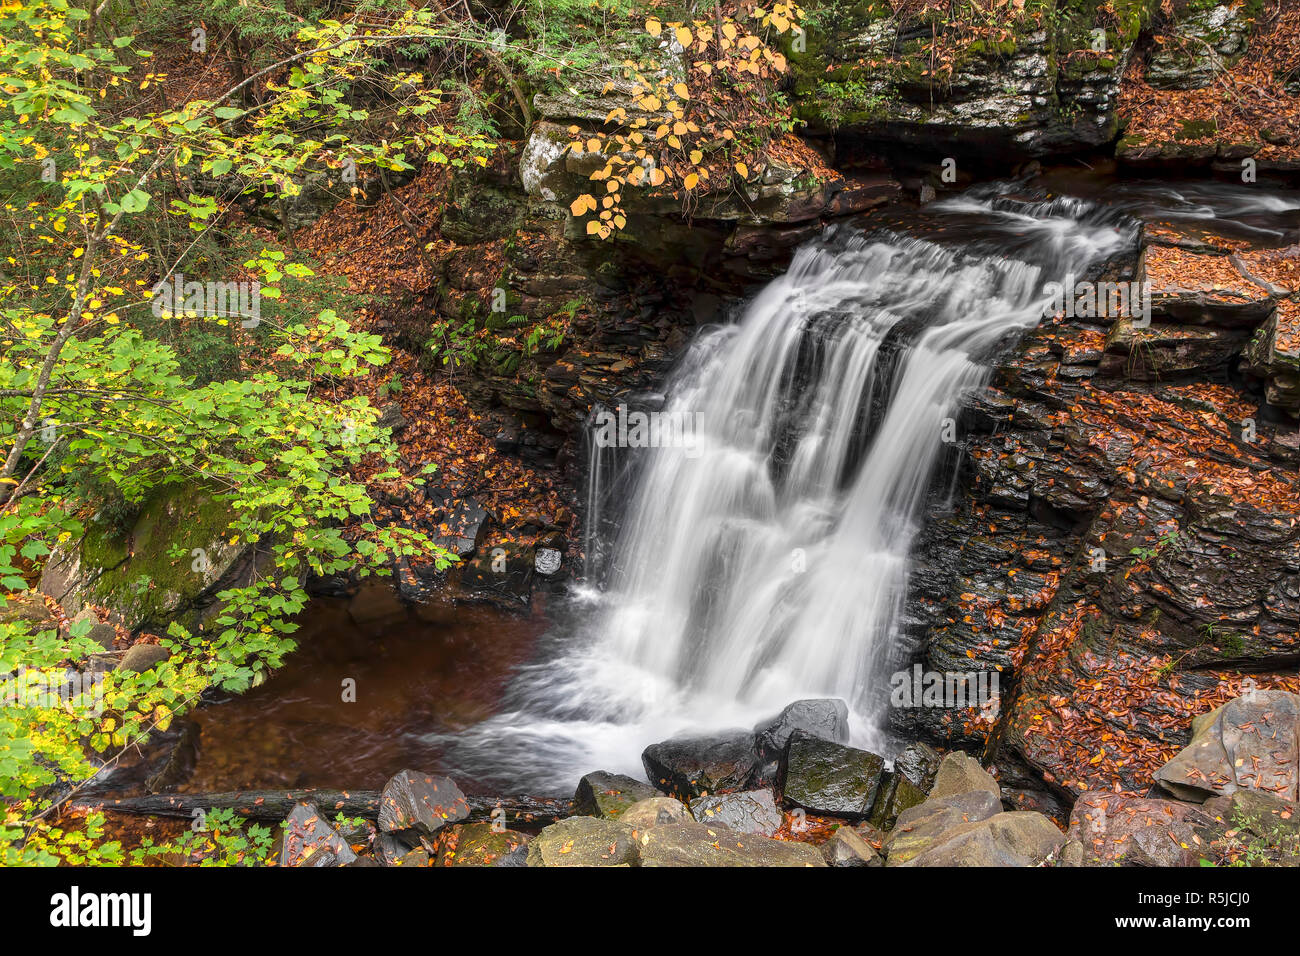 Big Run Falls splashes down a cliff in northeastern Pennsylvania on an autumn day. Stock Photo